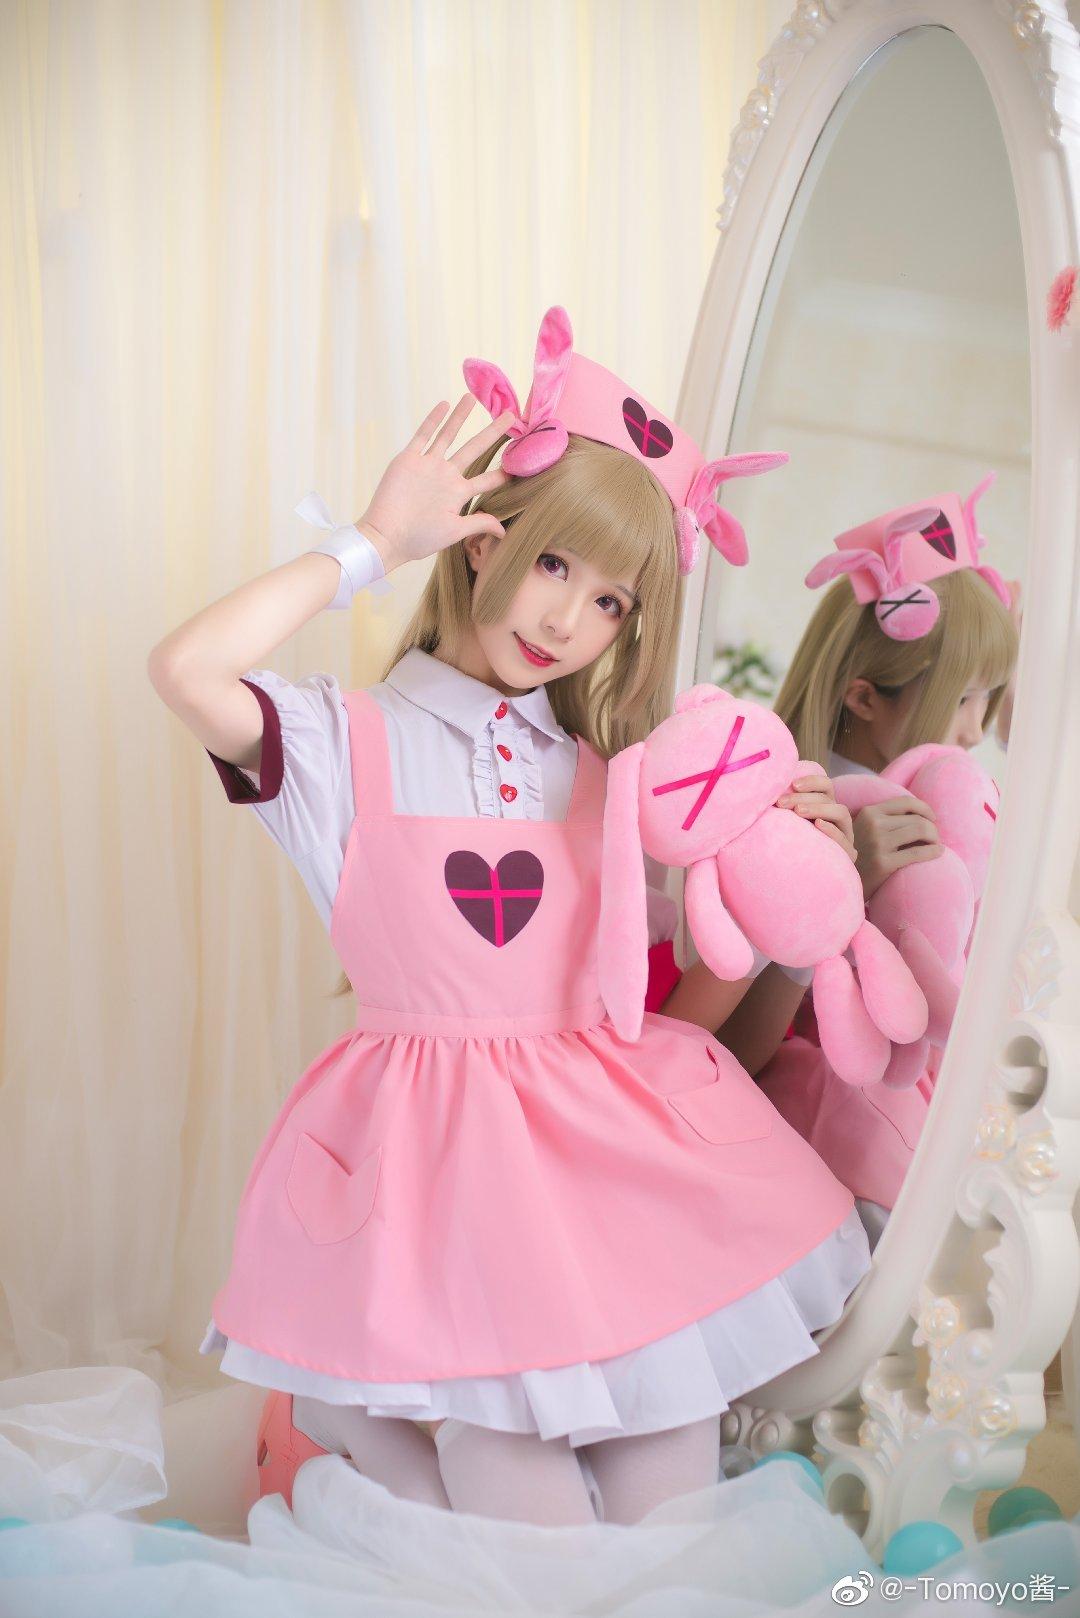 虚拟Youtuber   名取纱那(Natori Sana)   @Tomoyo酱 (9P)-第1张